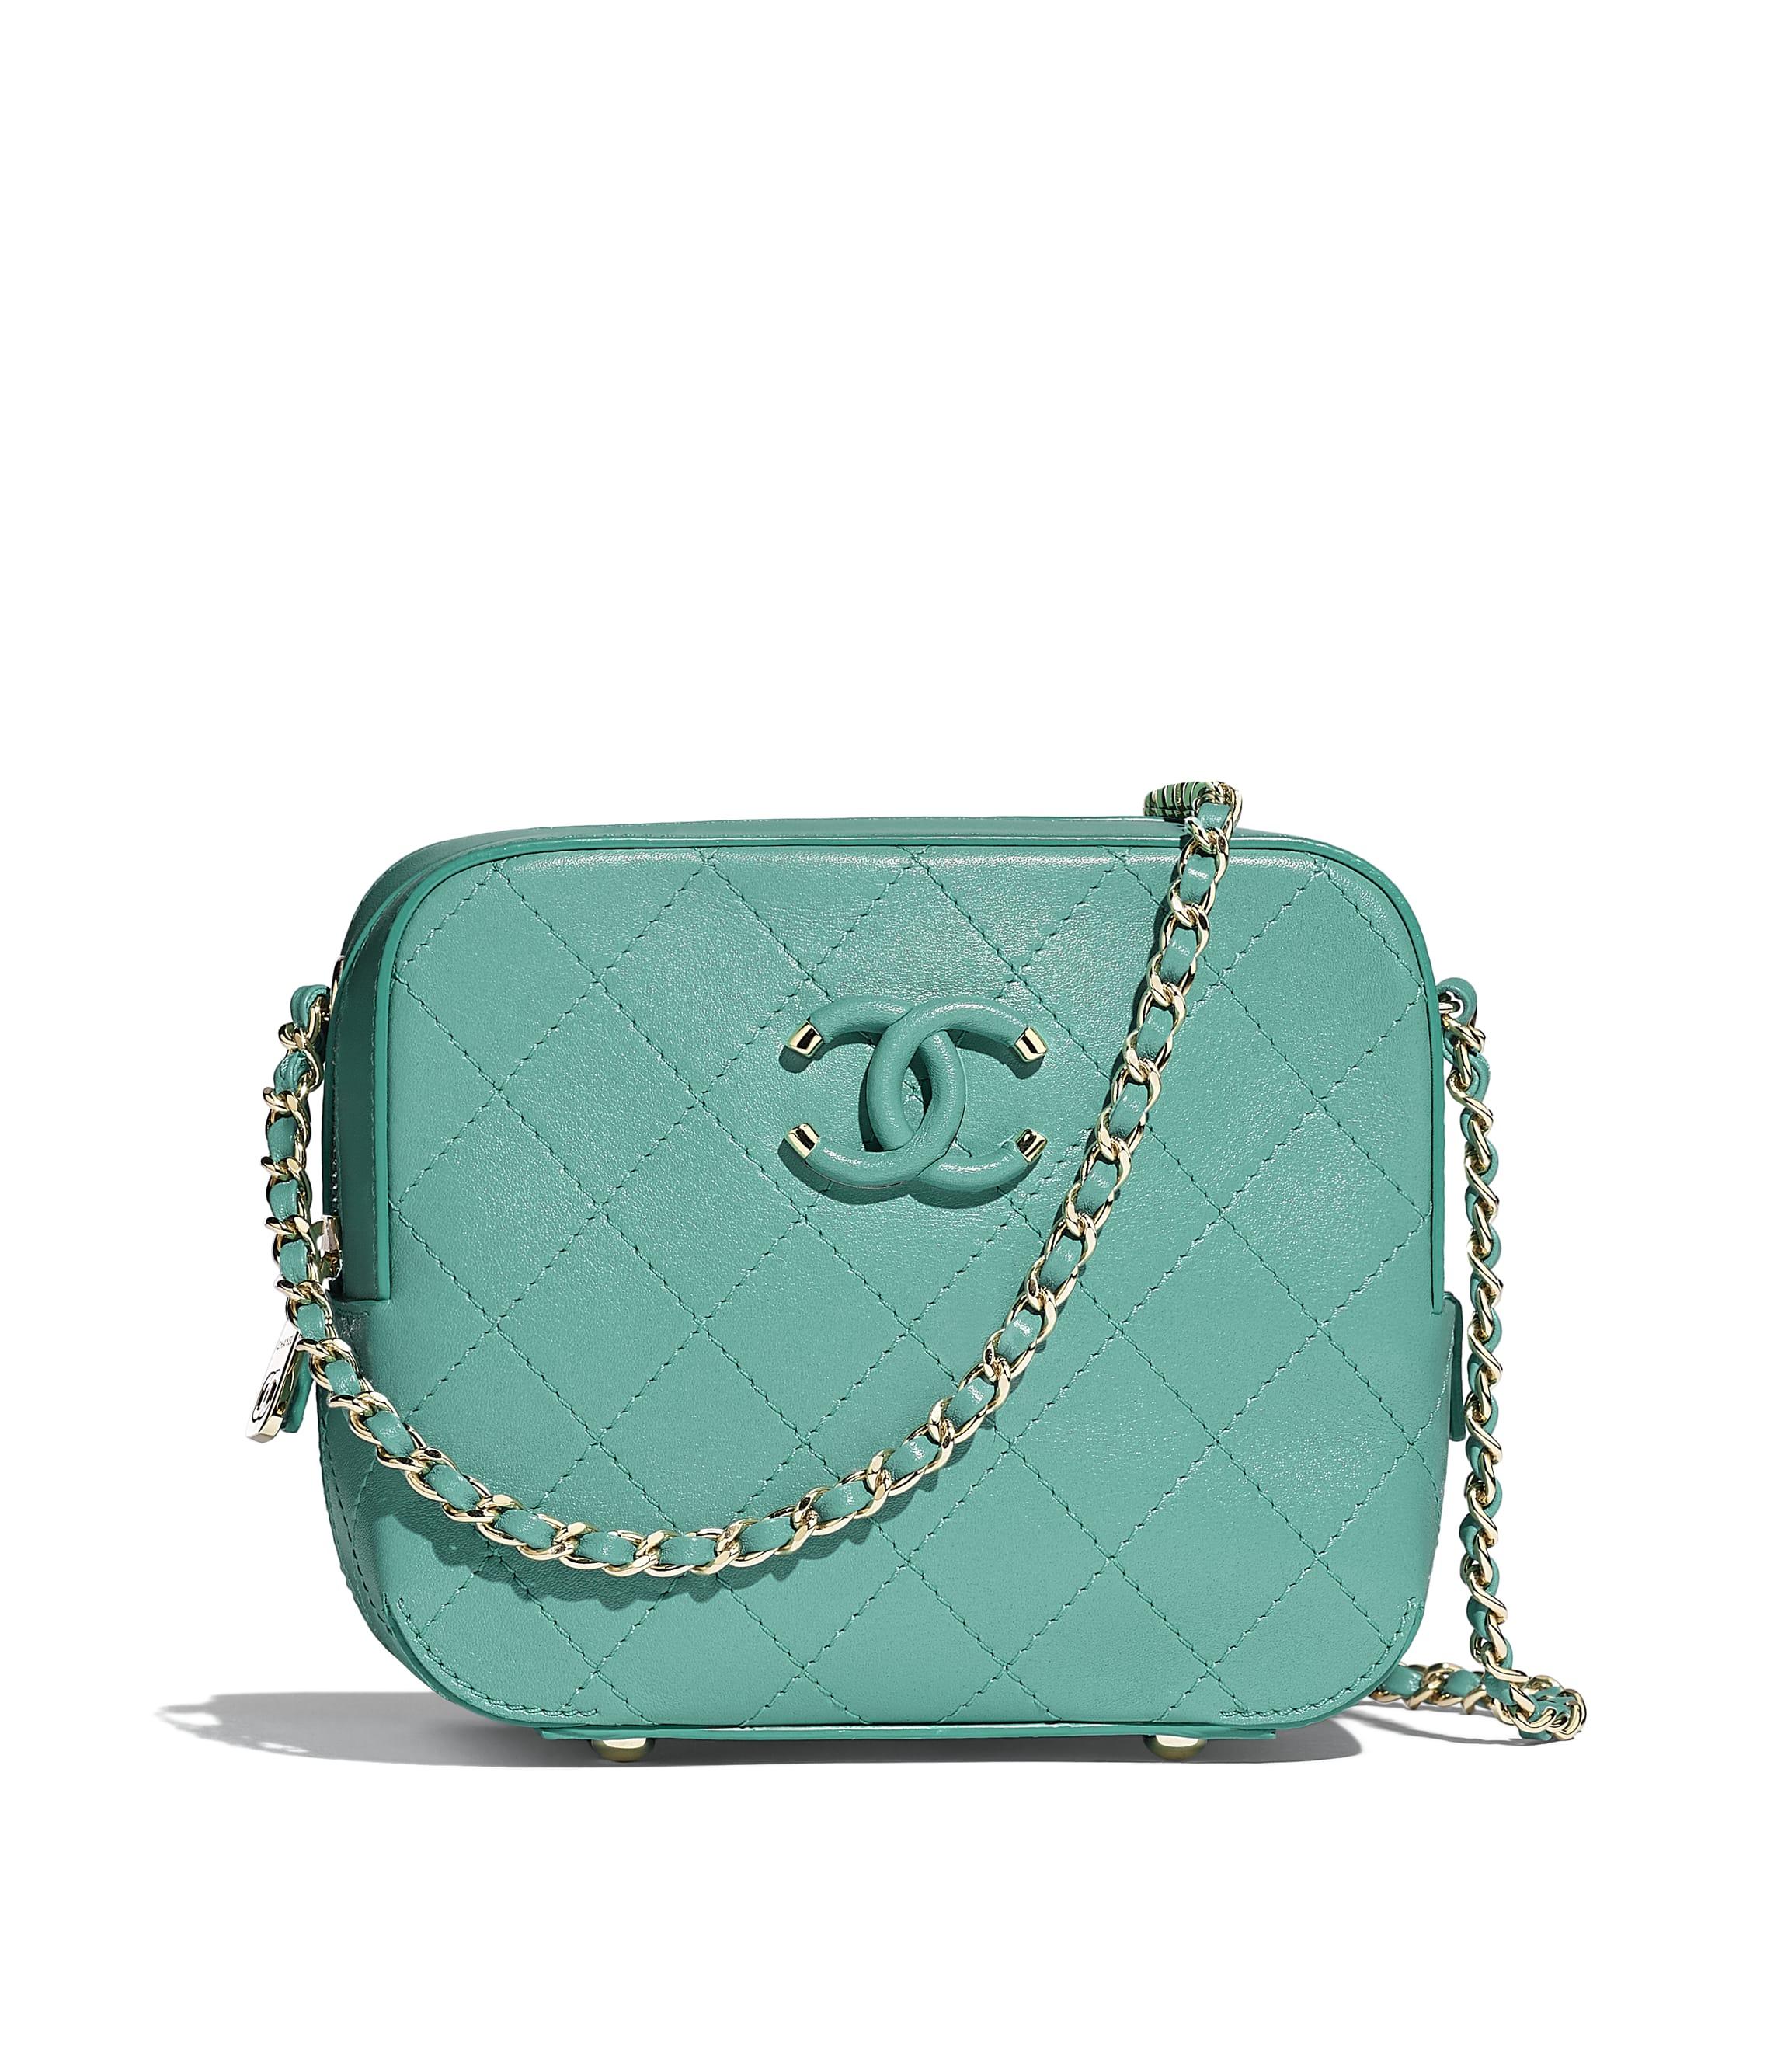 8b72cf4def5 Handbags - CHANEL